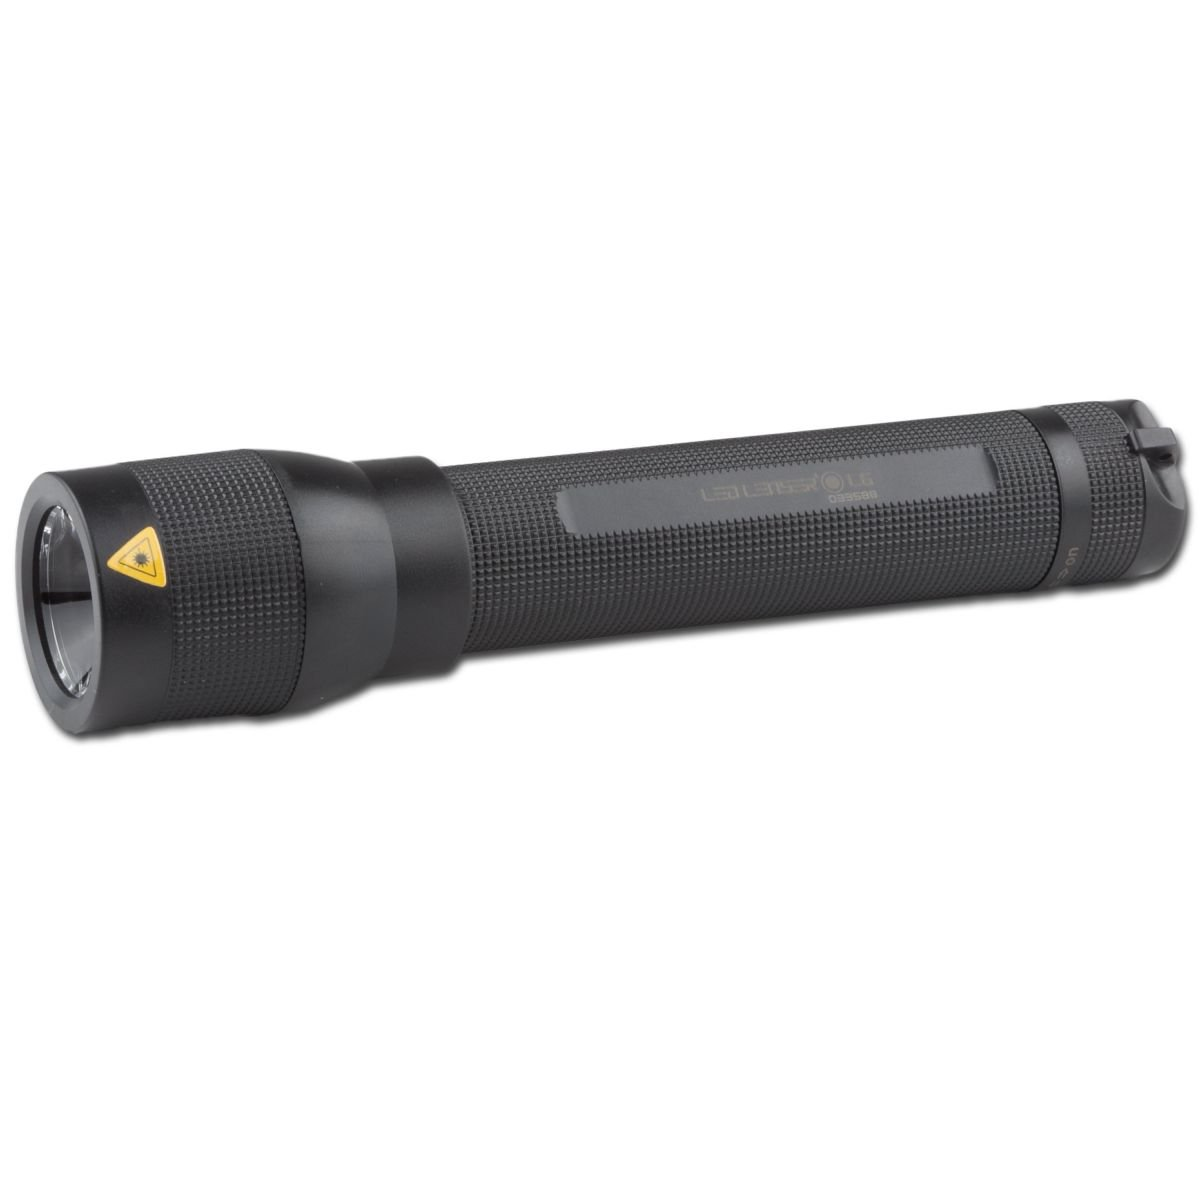 Lampe LED Lenser L6